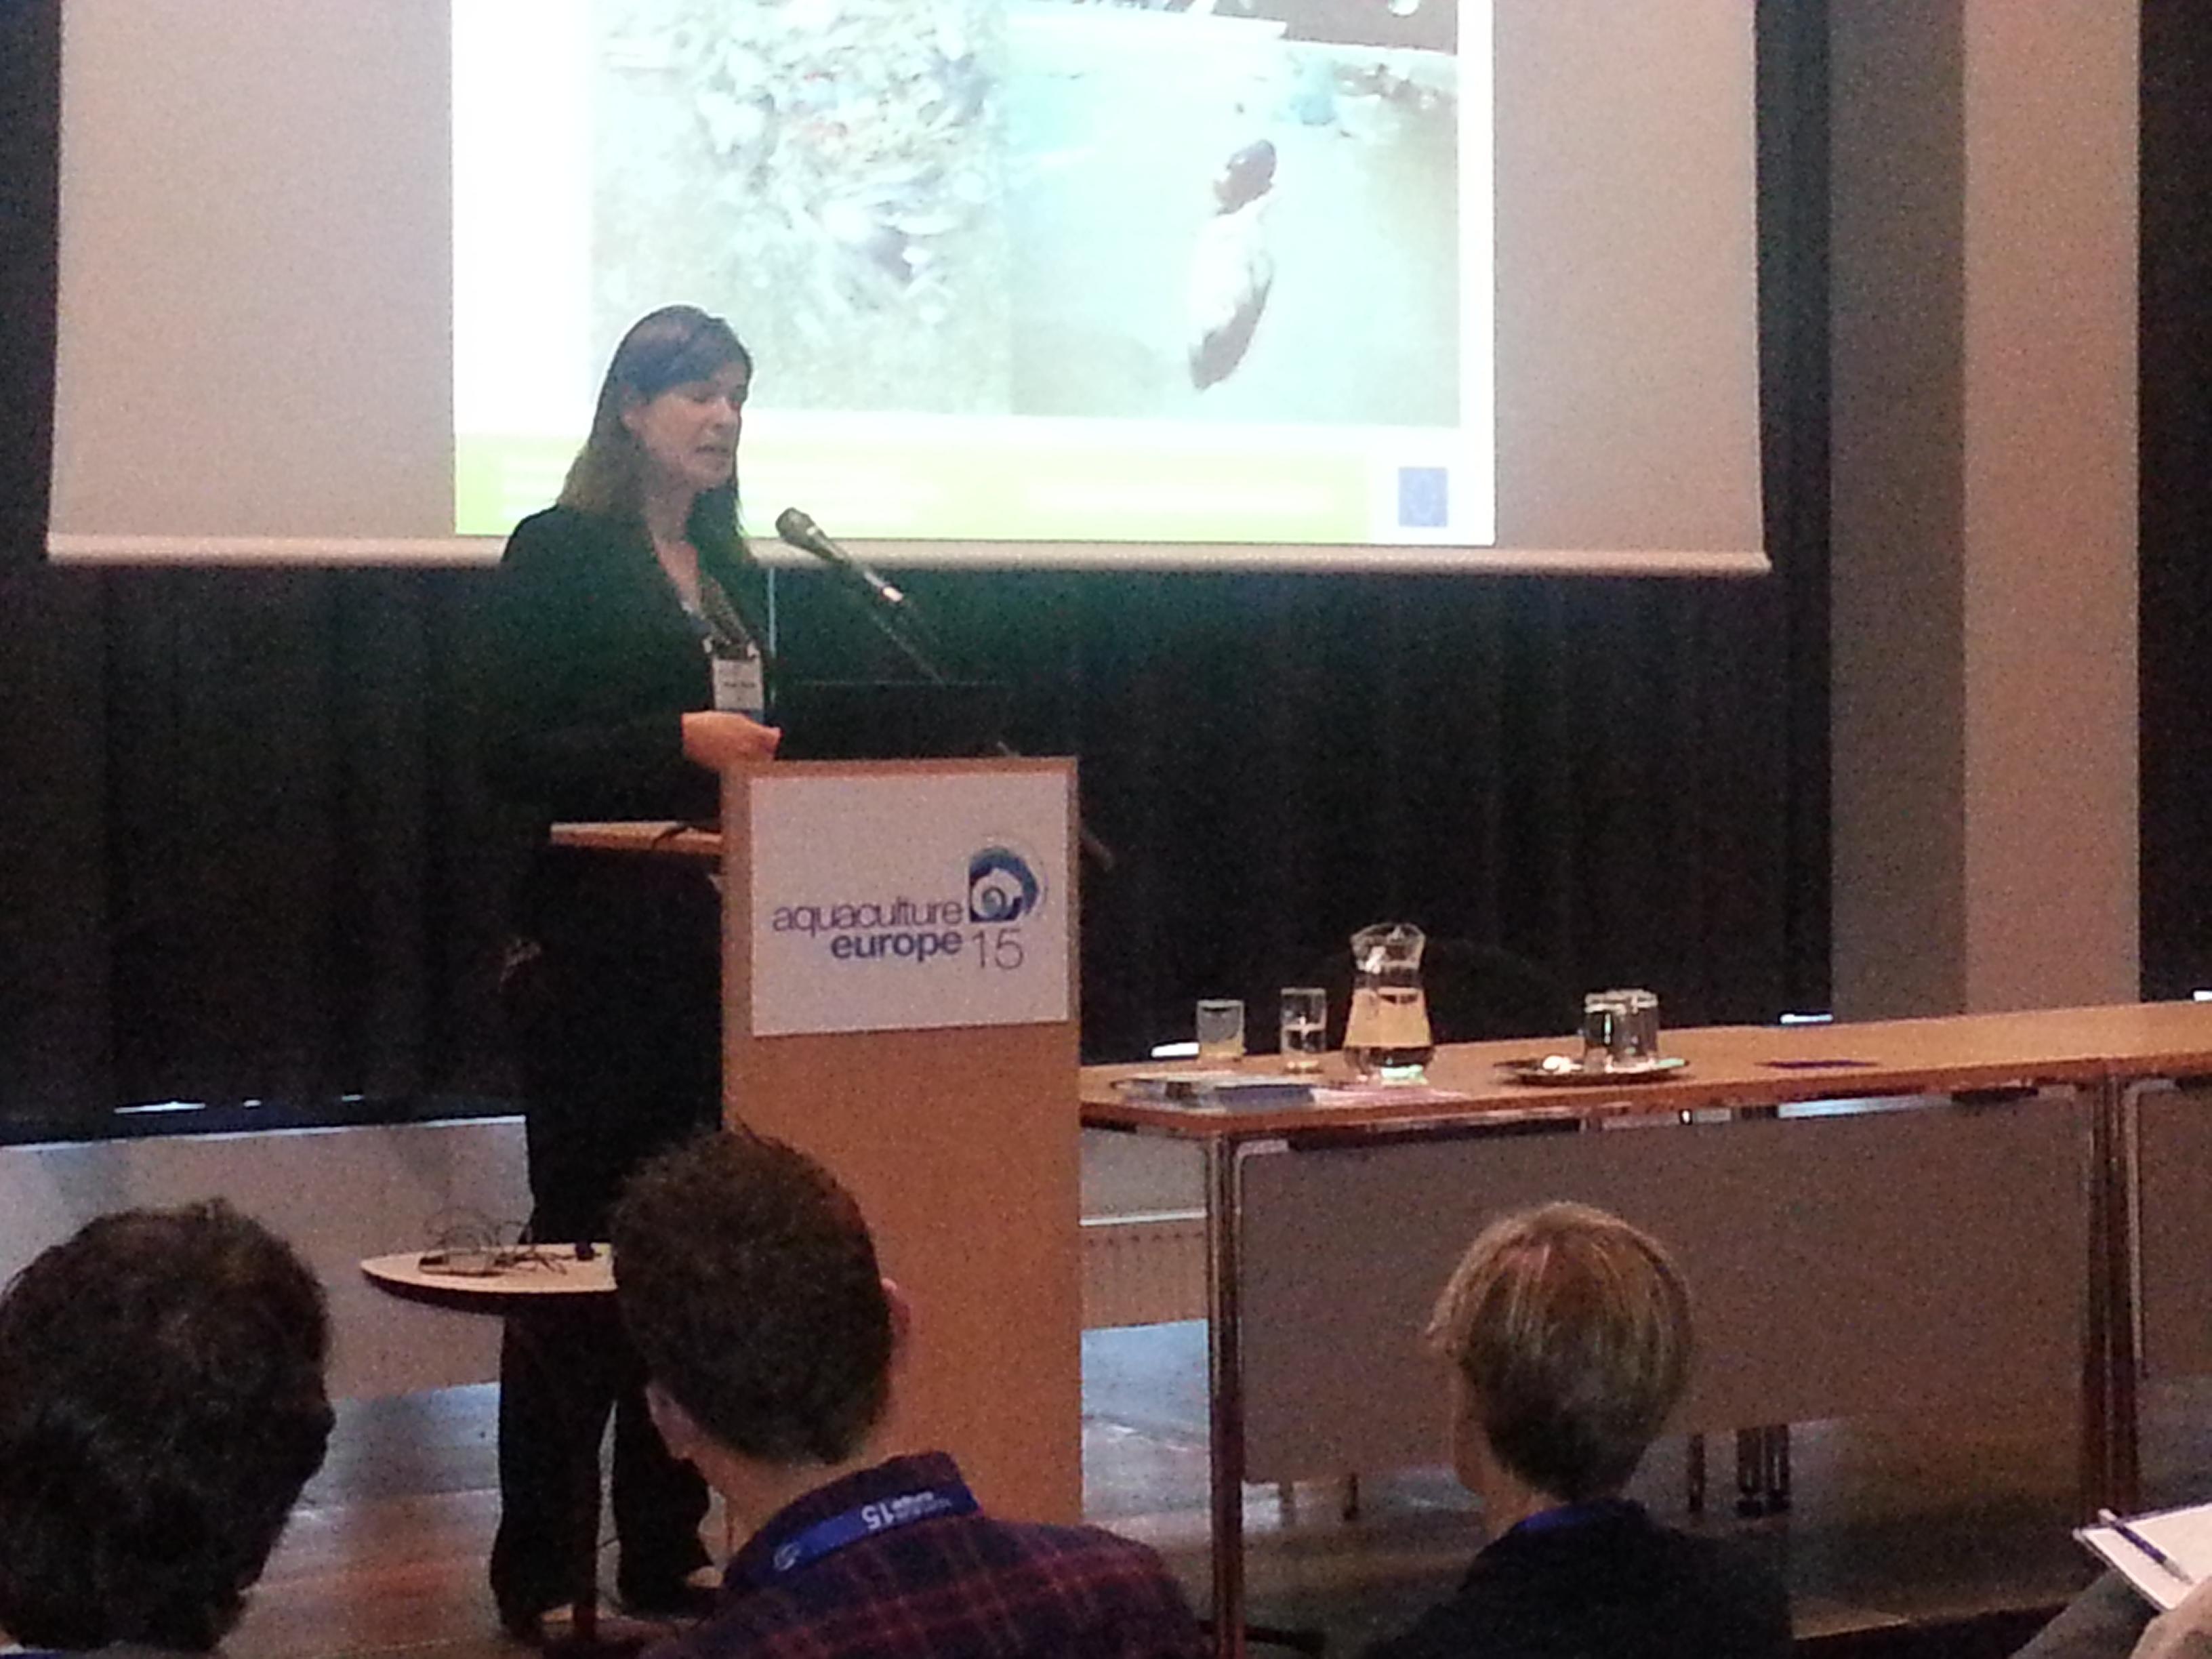 Marieke presenting